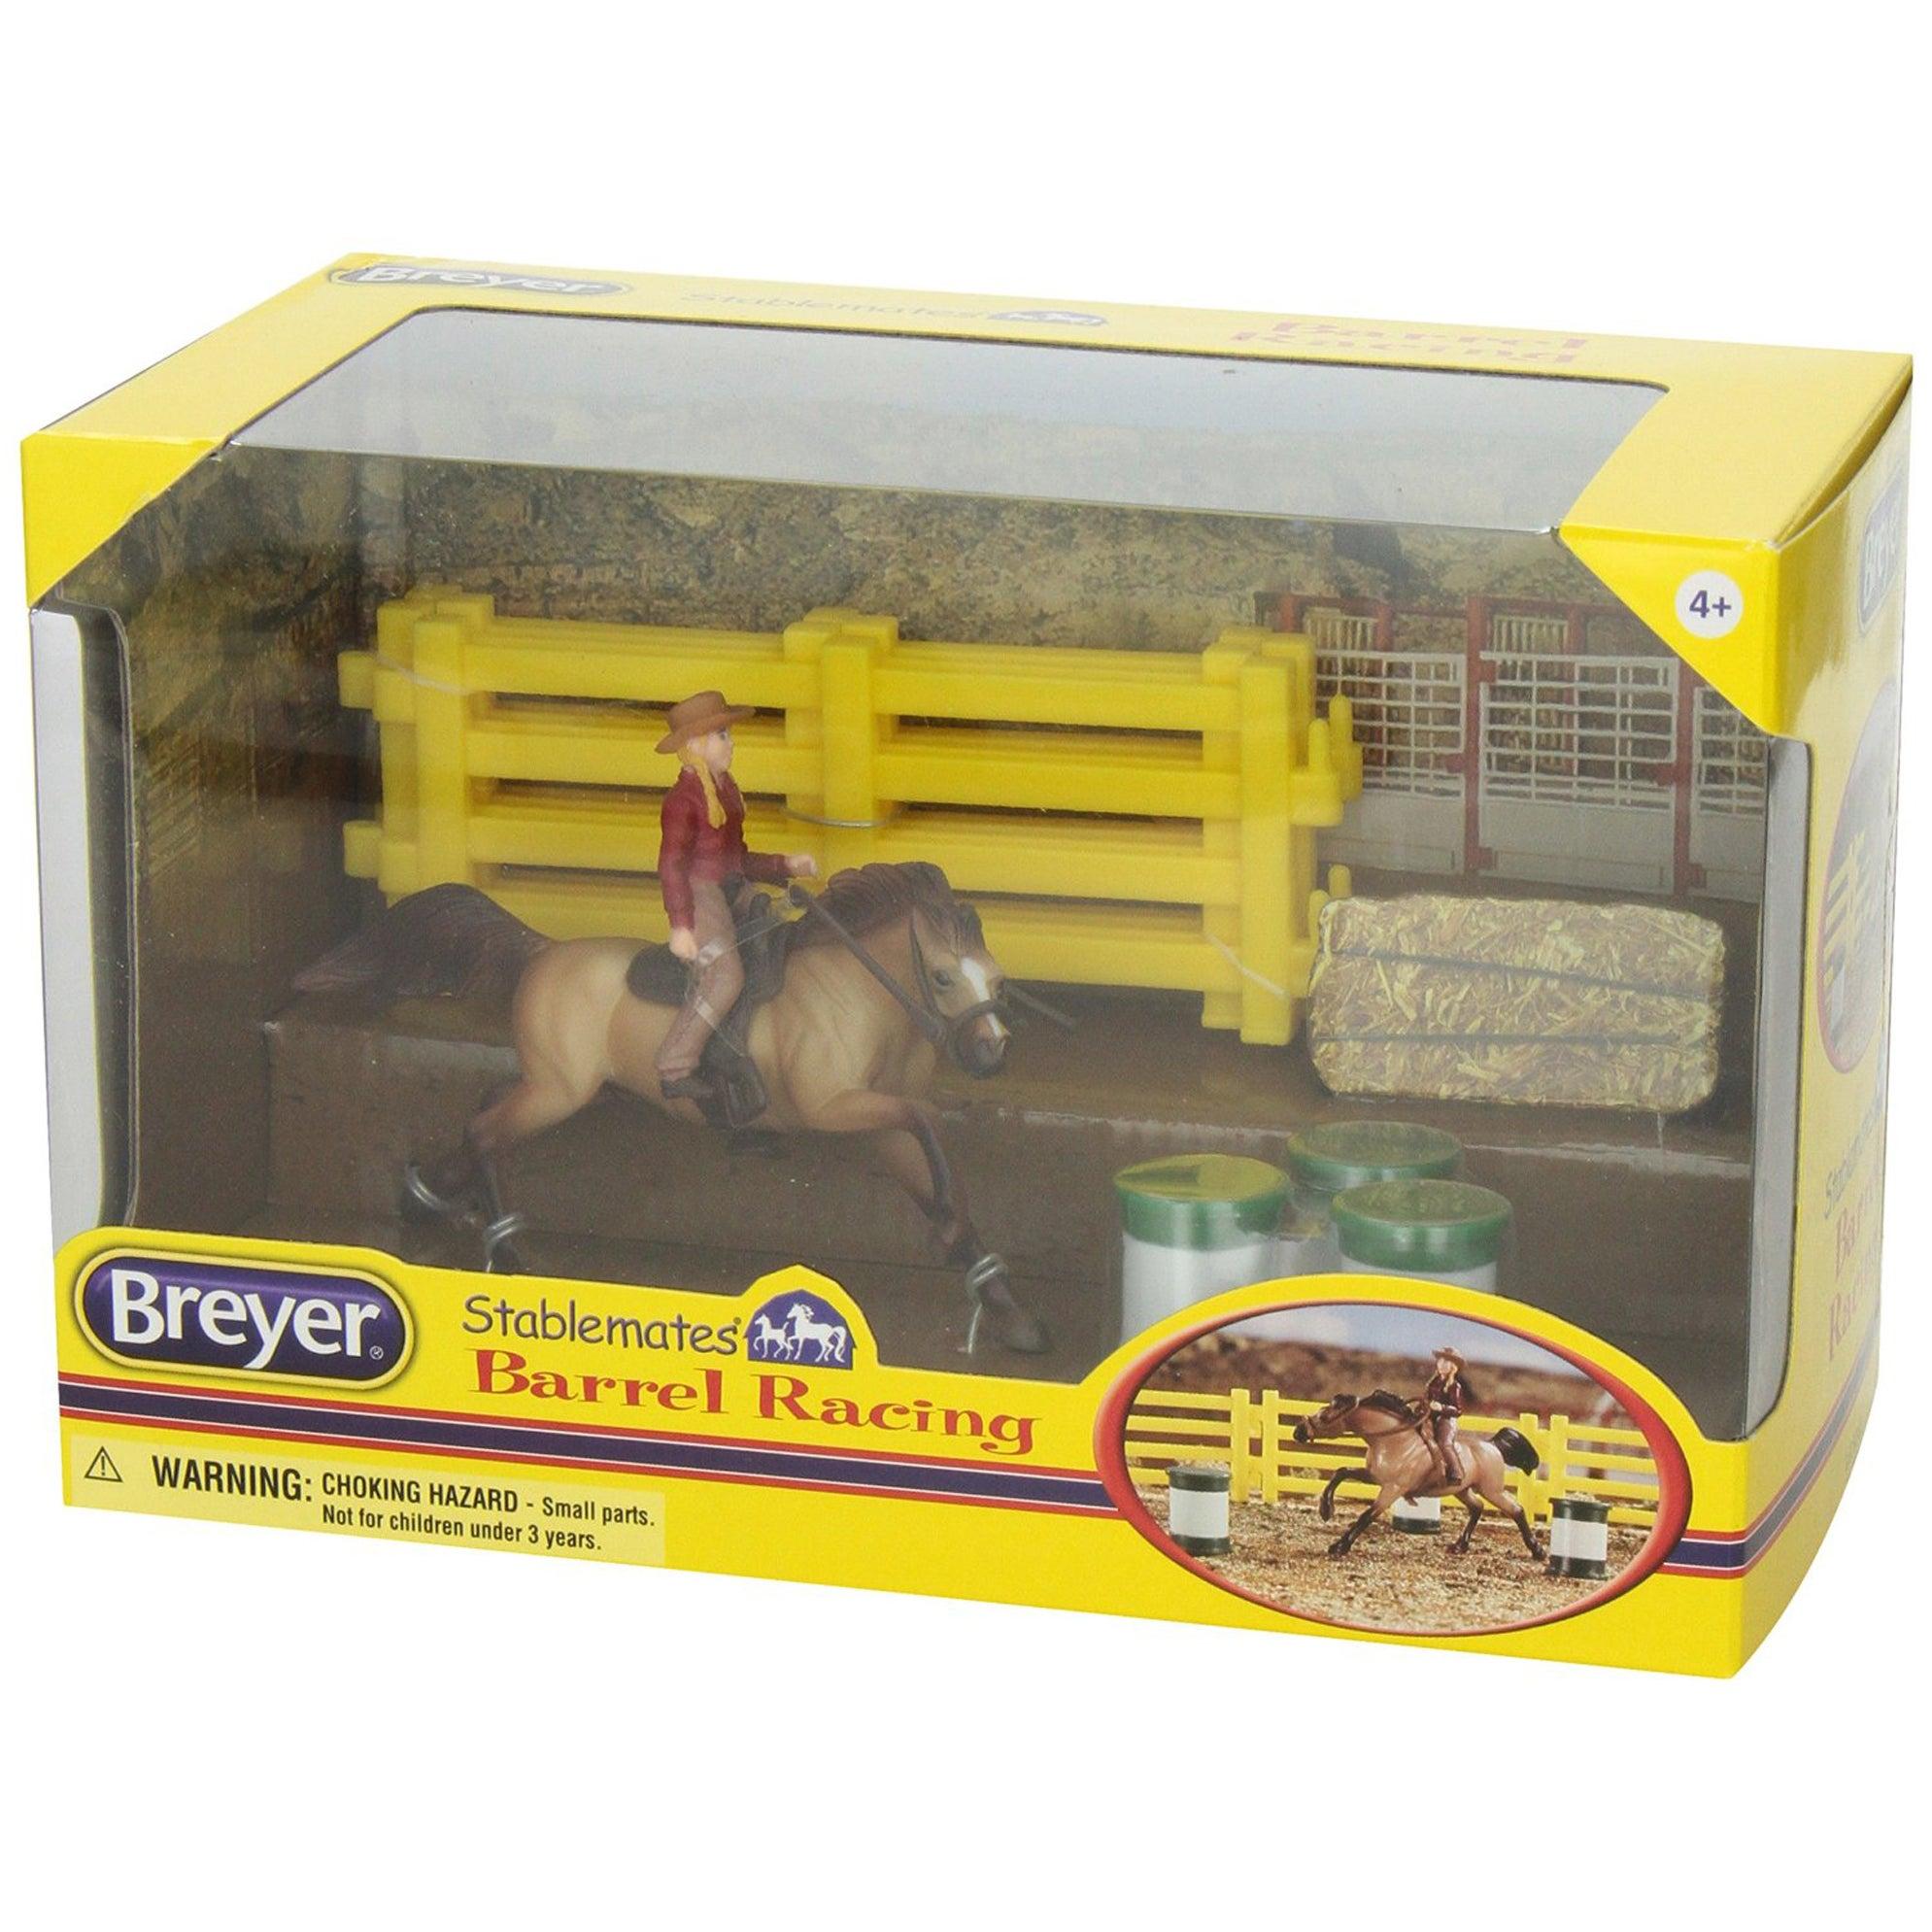 Reeves Breyer Stablemates Barrel Racing (G019756053772)